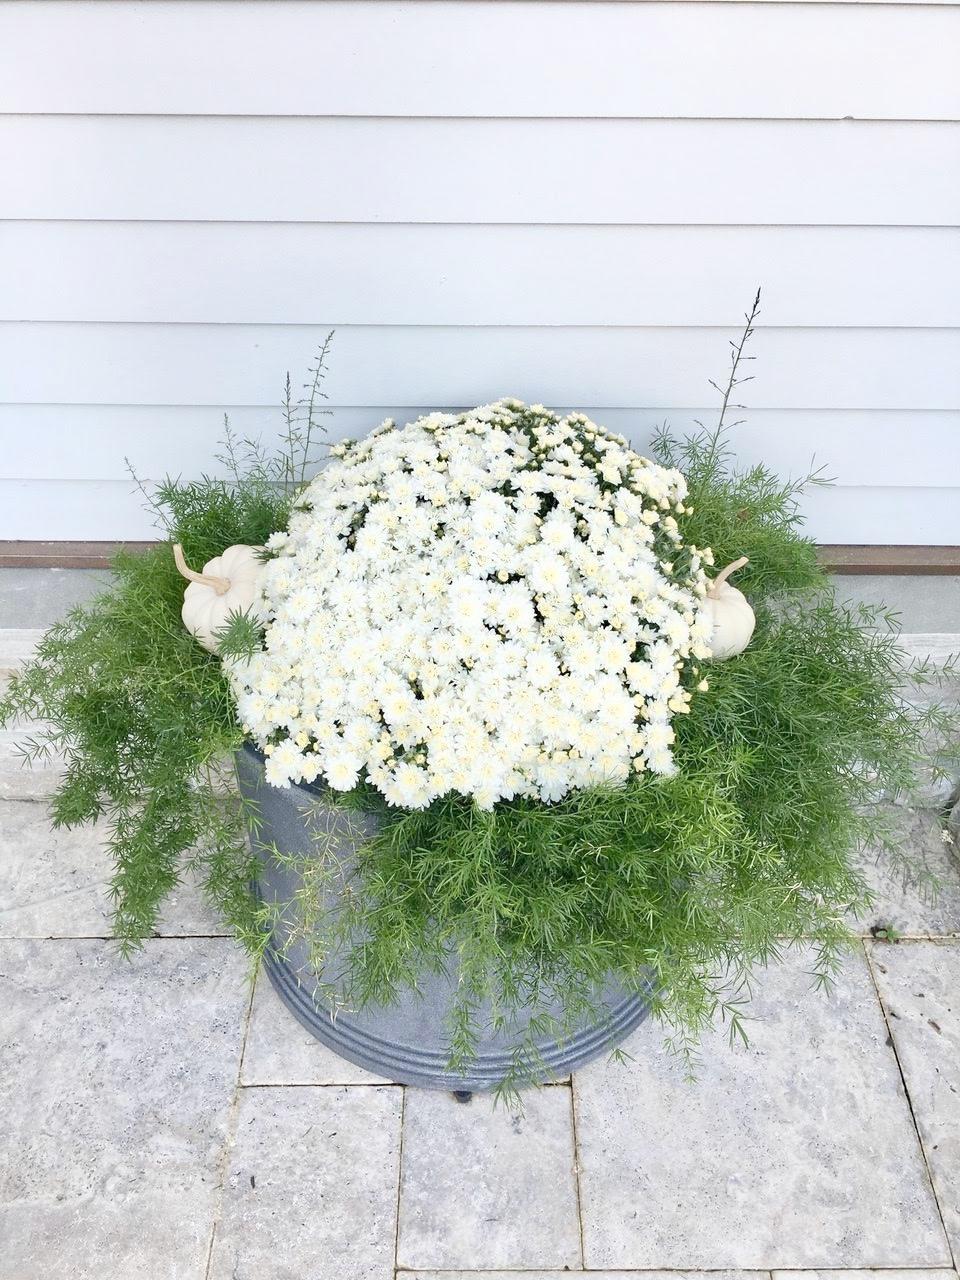 White mums, white pumpkins, and asparagus fern in galvanized tub